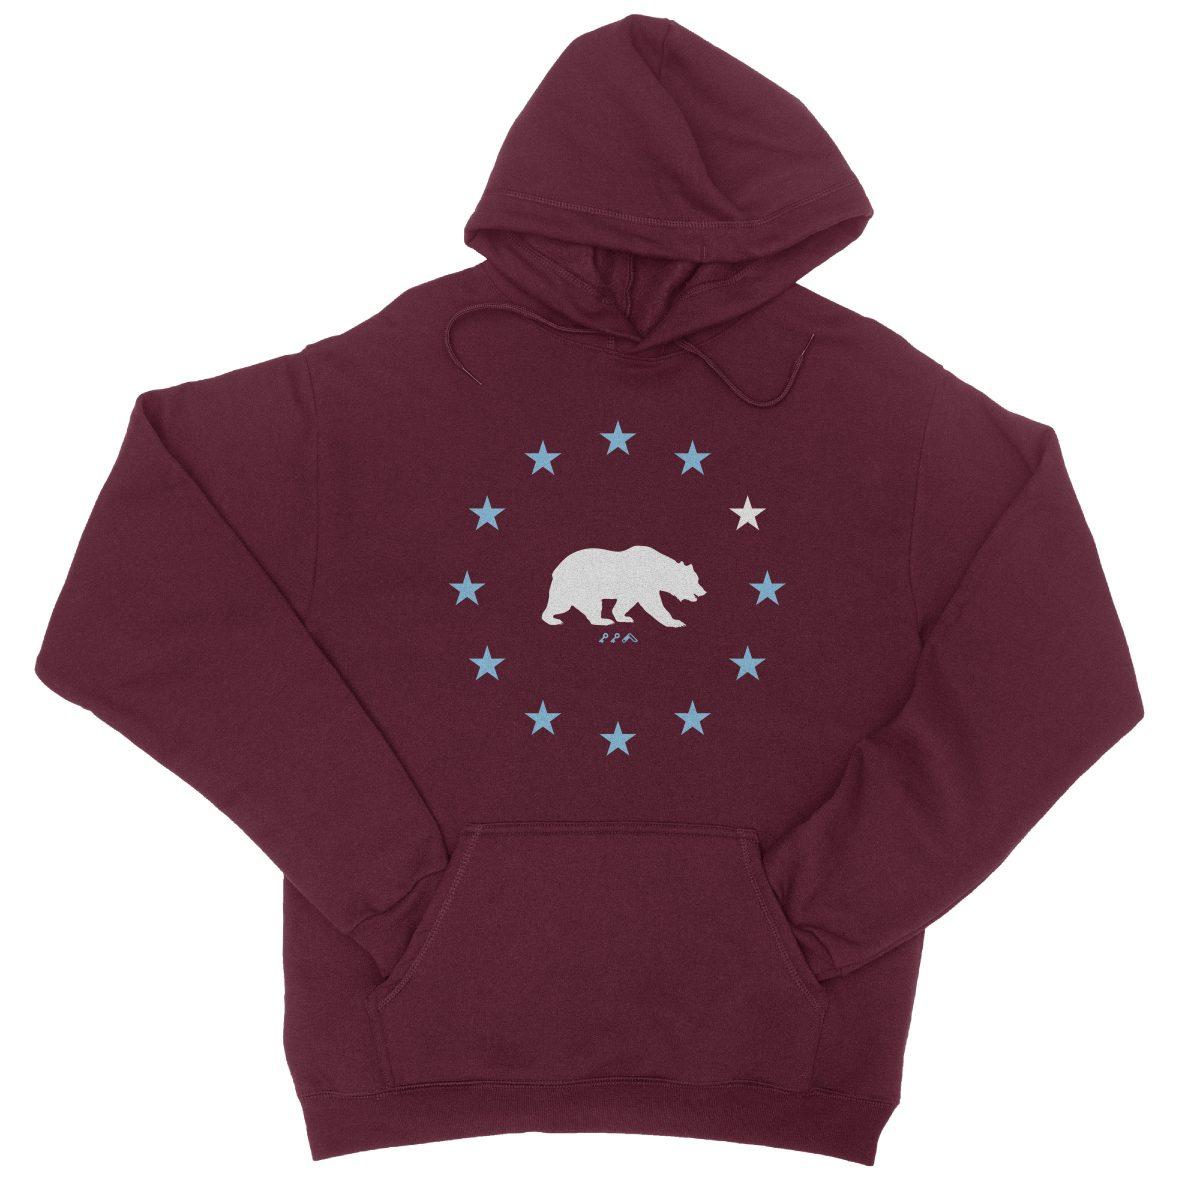 STAR GAZING california republic cali bear hoodie in maroon by kikicutt